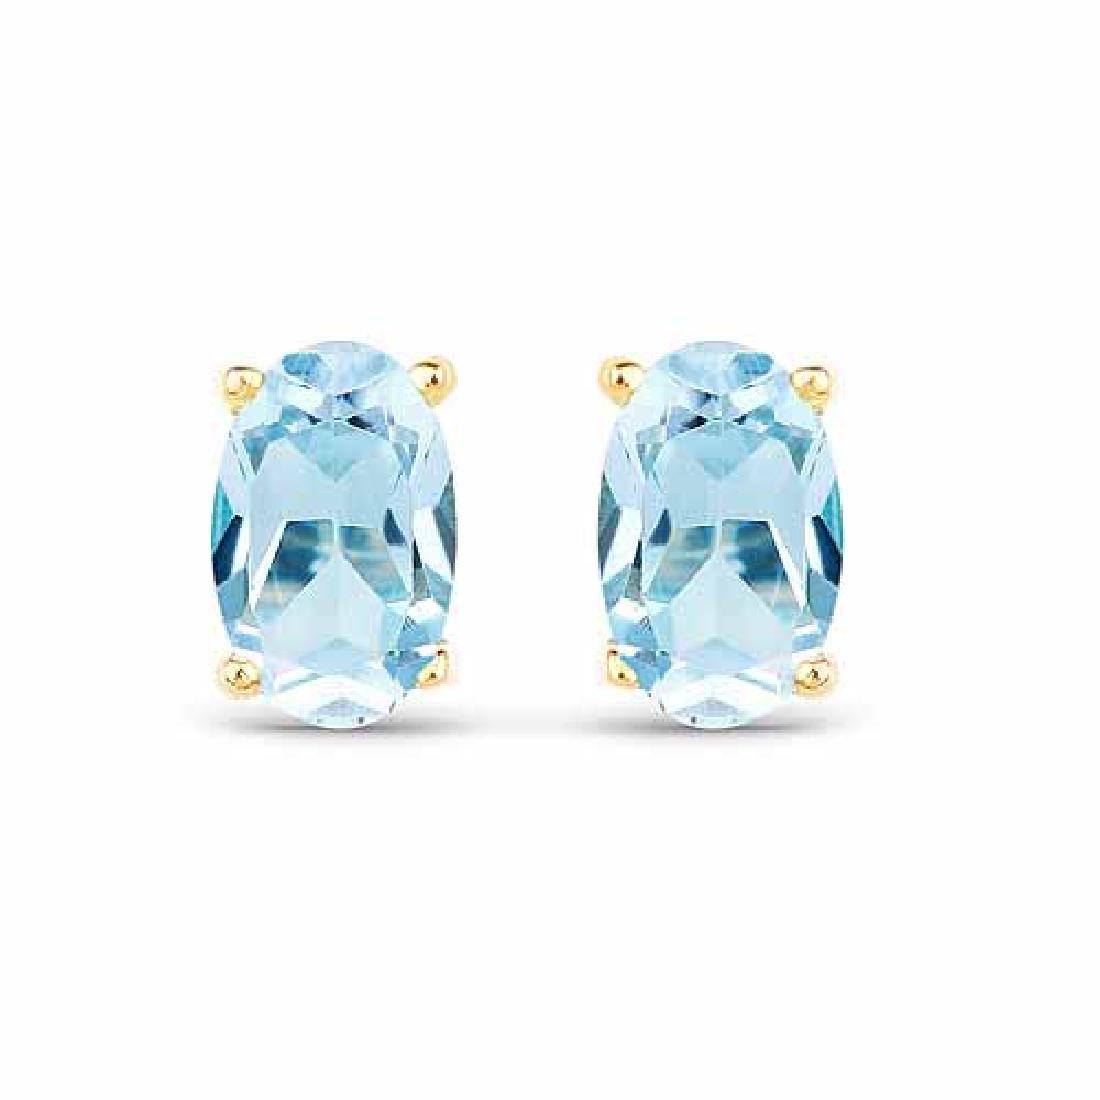 0.70 Carat Genuine Blue Topaz 10K Yellow Gold Earrings